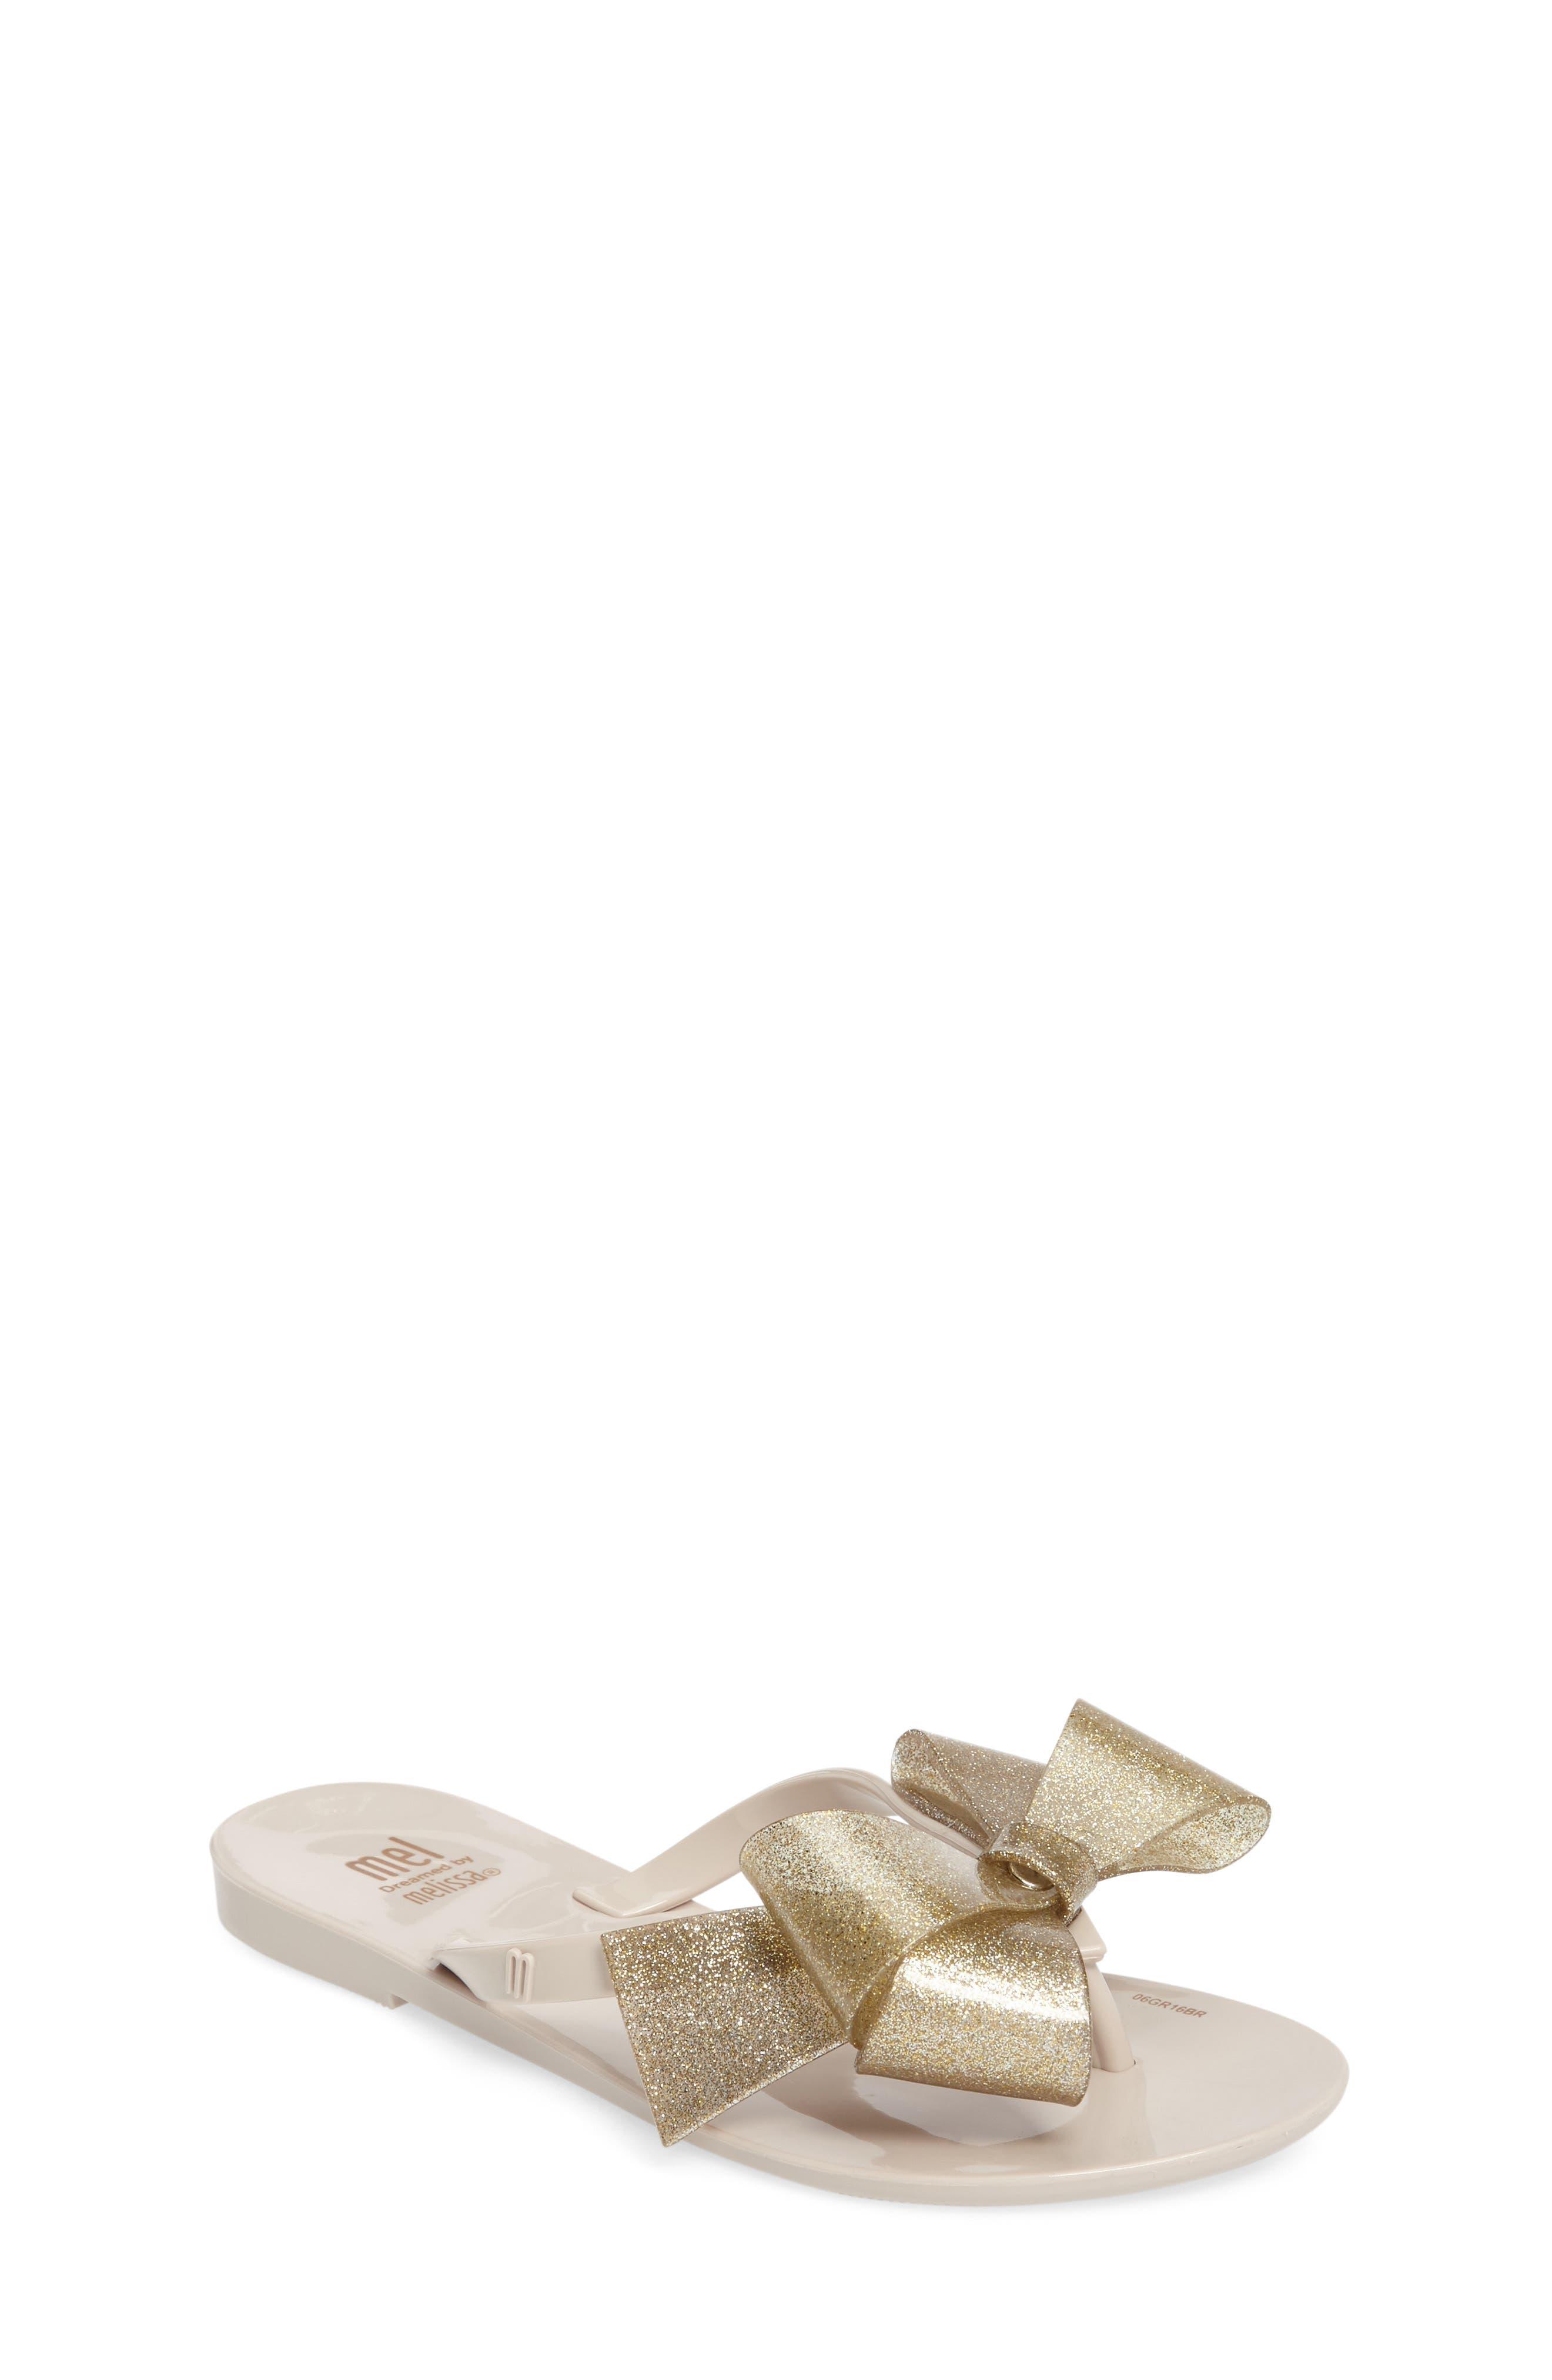 Harmonic Bow III Sandal,                             Main thumbnail 1, color,                             Beige Gold Glitter